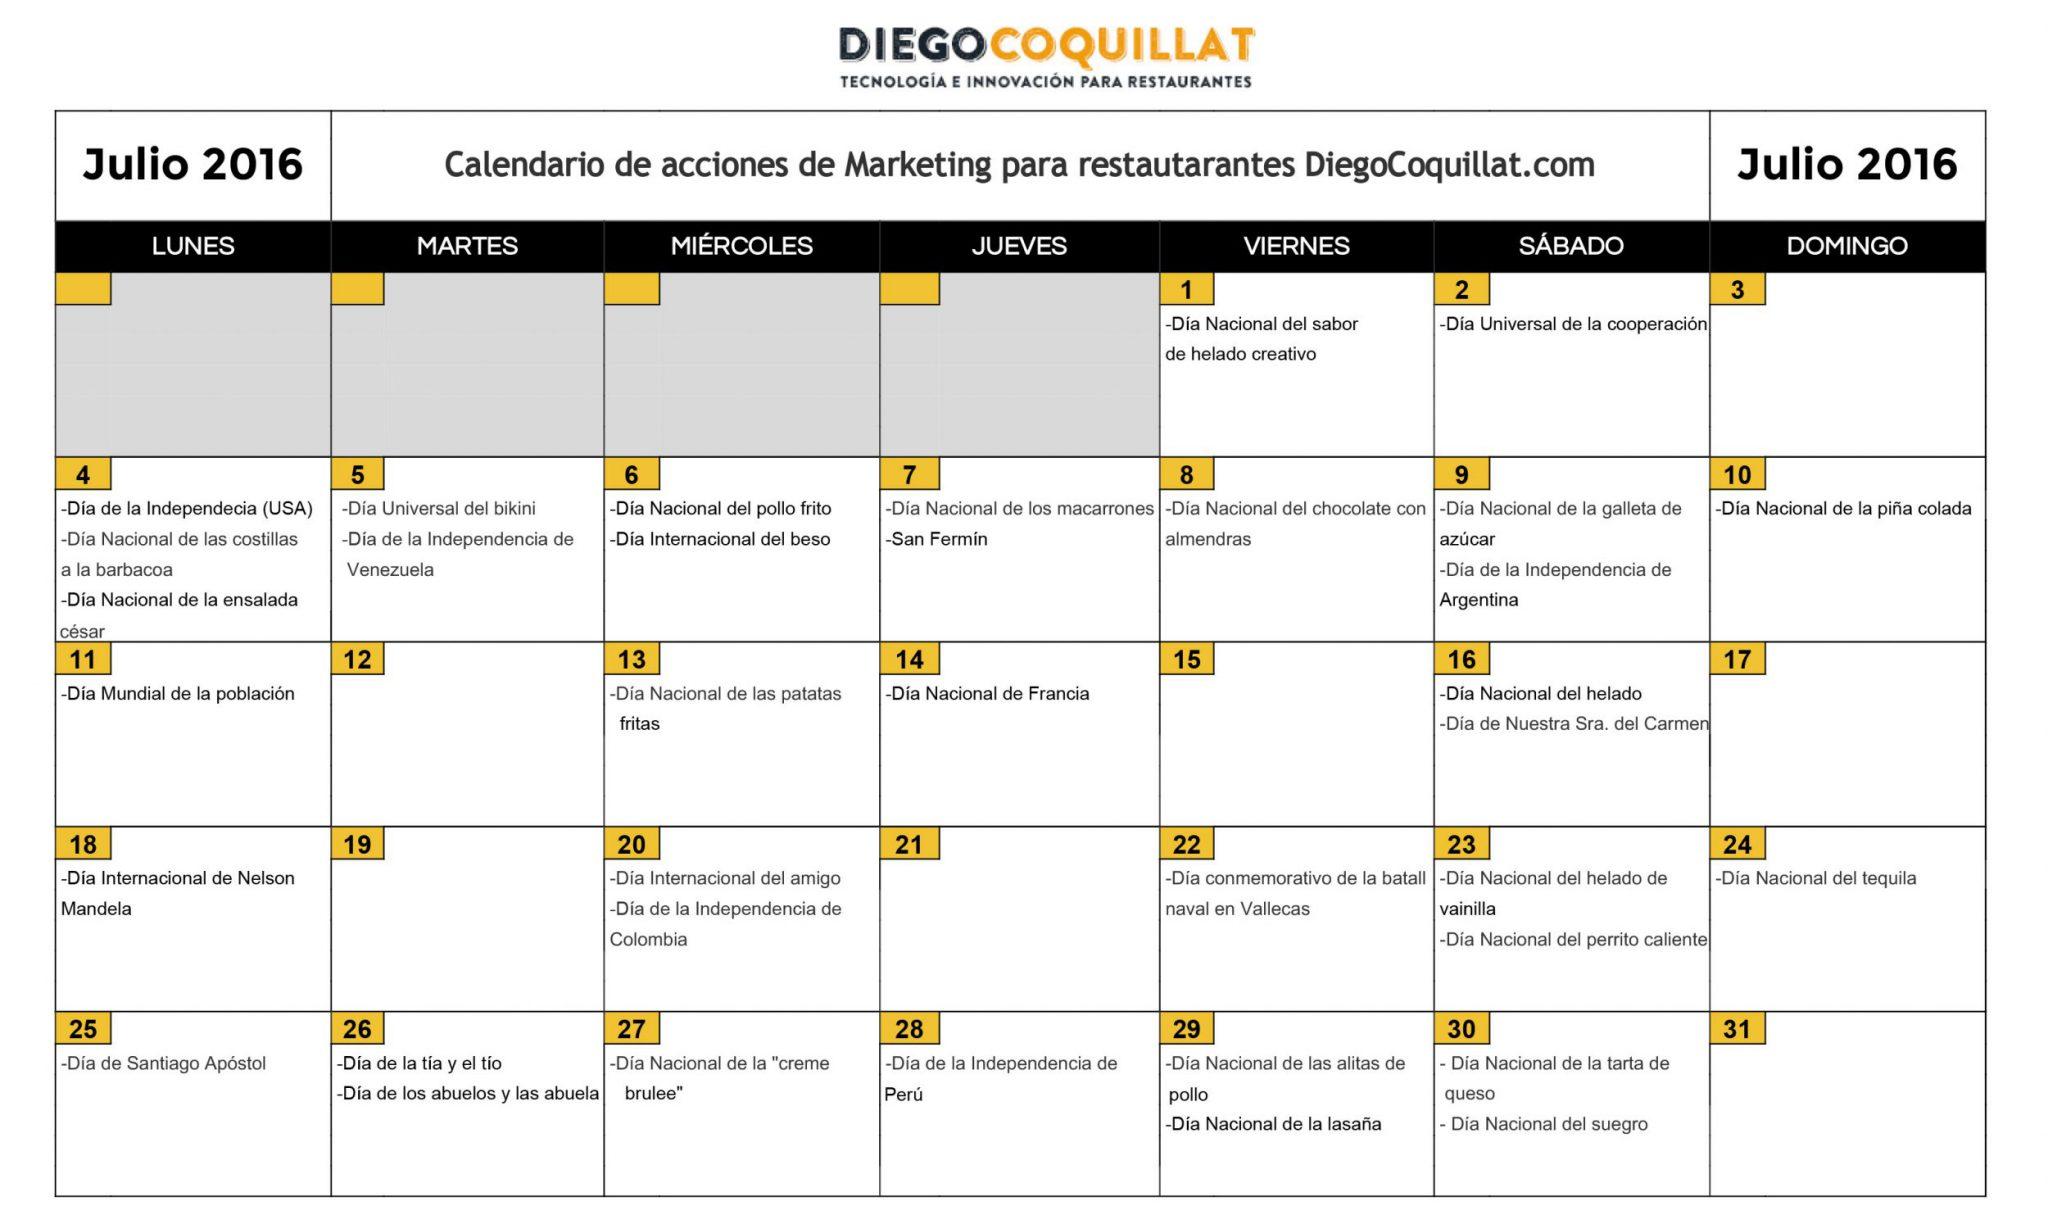 July 2016: Calendar of shares of marketing for restaurant